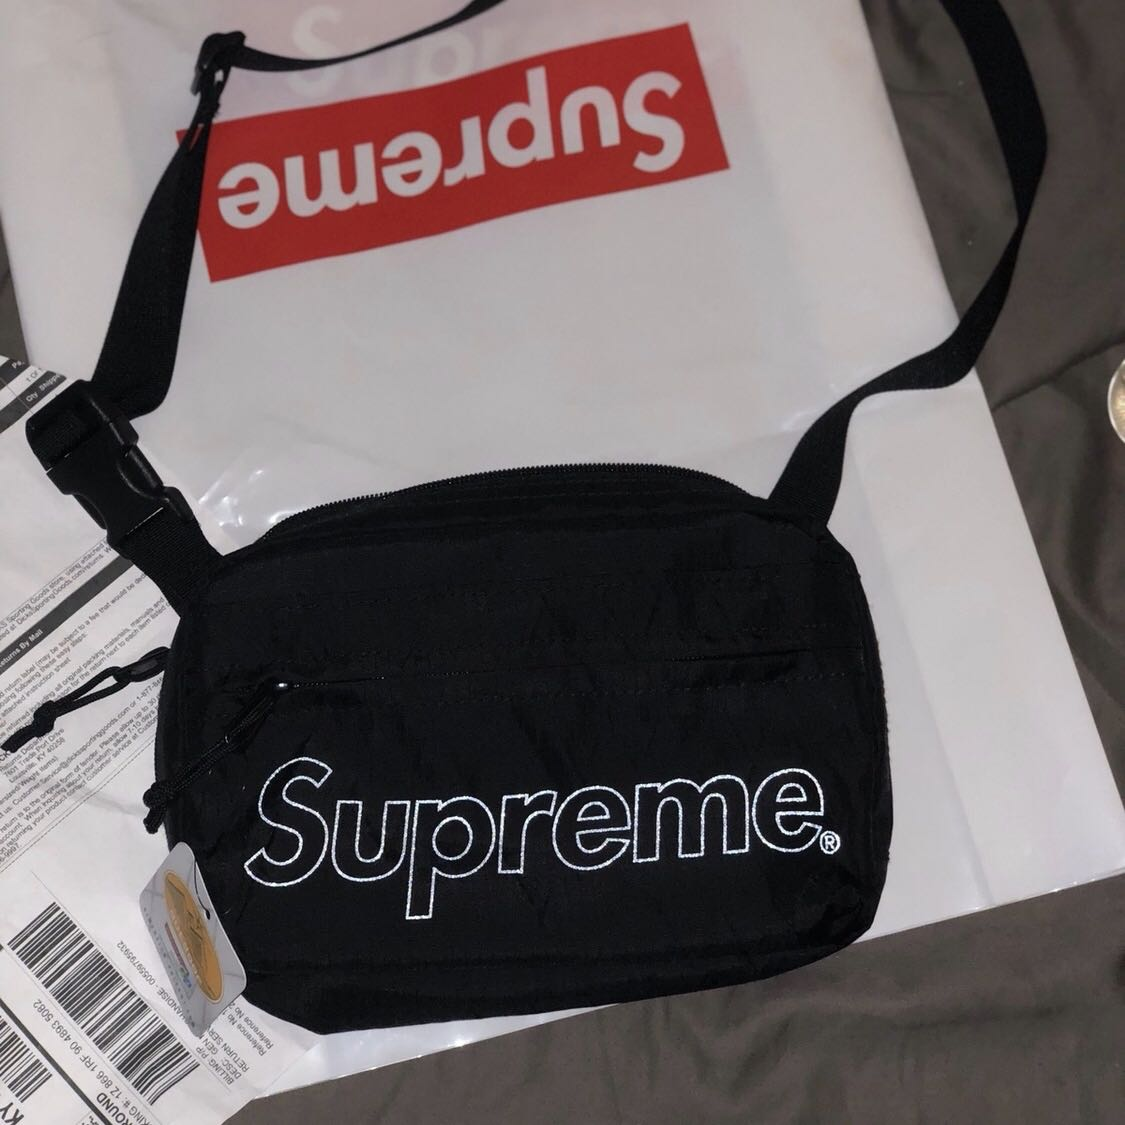 8c069f6300c Supreme Shoulder Bag FW18 Black, Men's Fashion, Bags & Wallets, Sling Bags  on Carousell